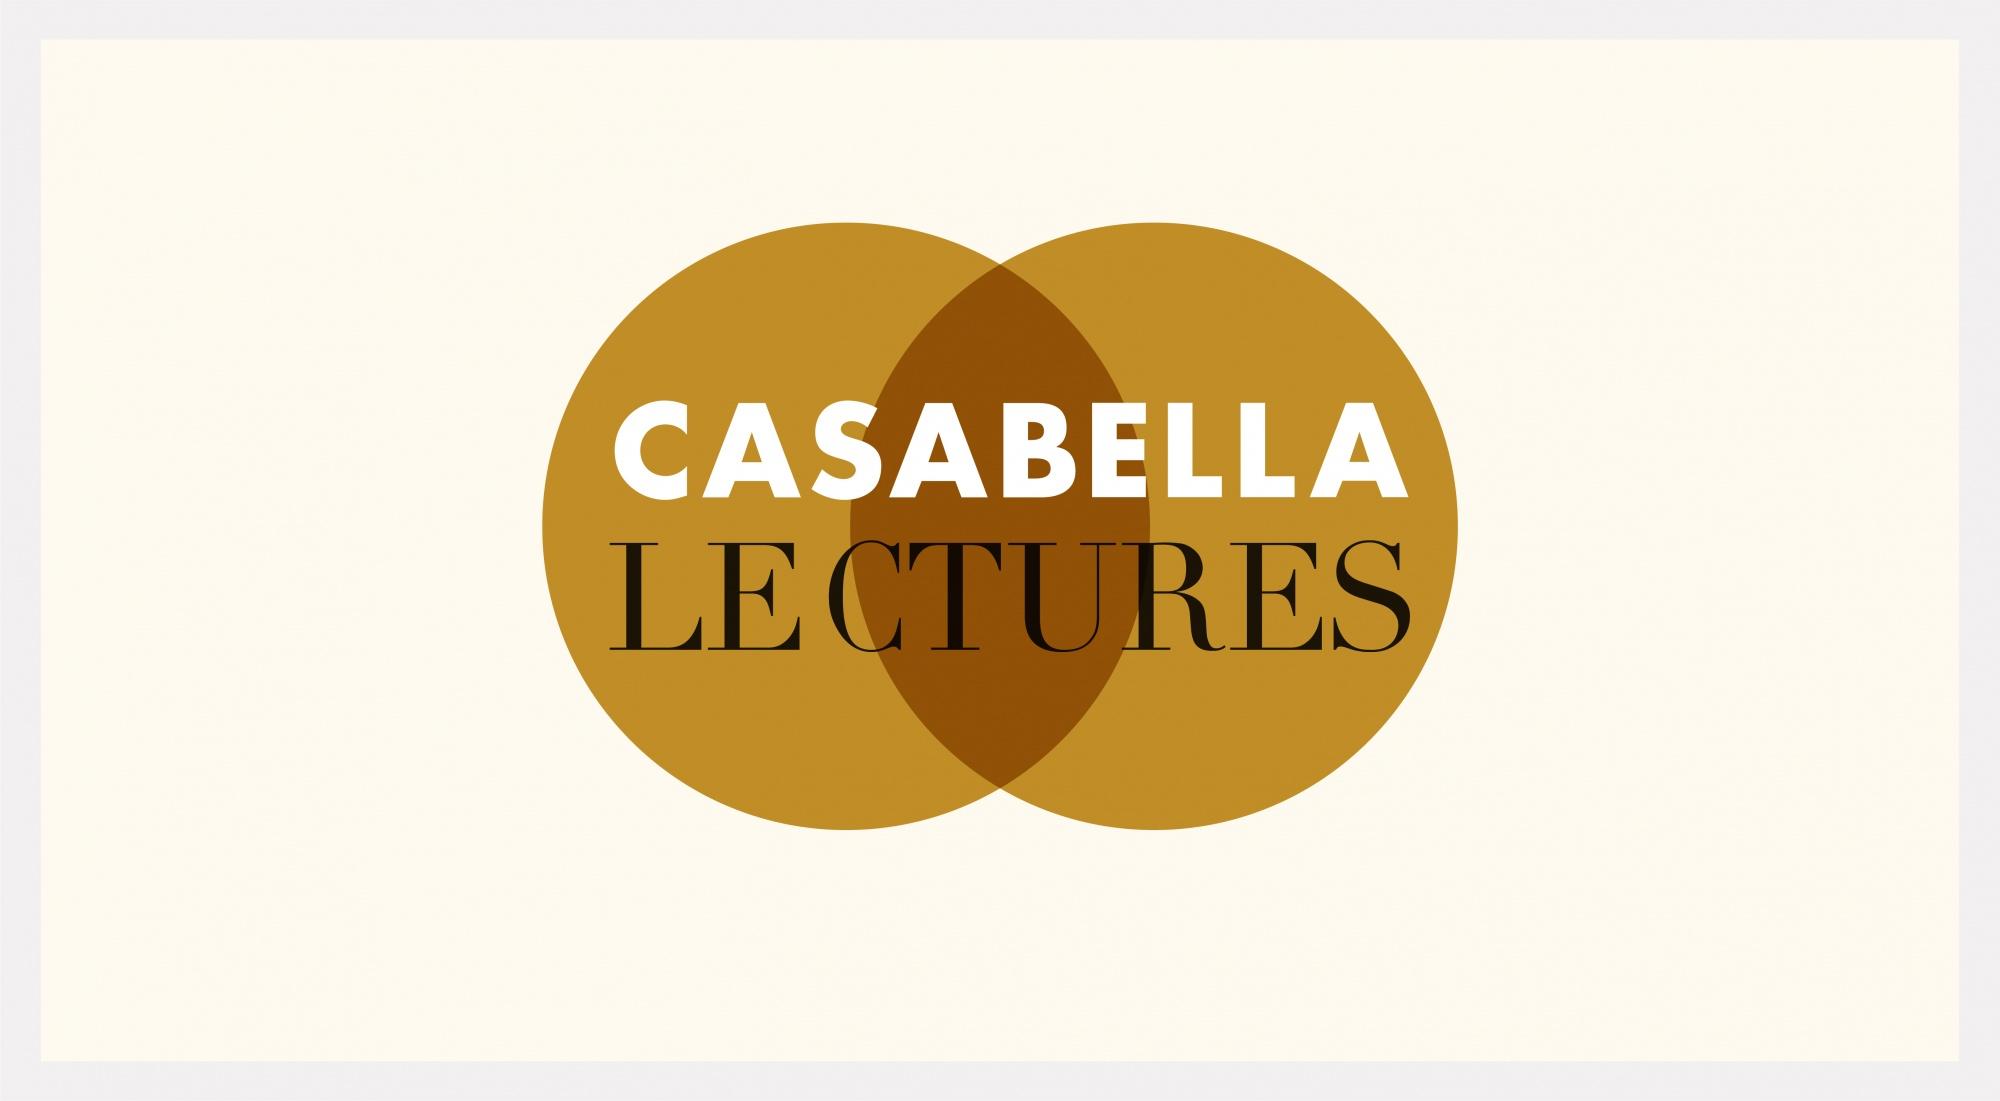 ALPI sponsors the CASABELLA Lectures